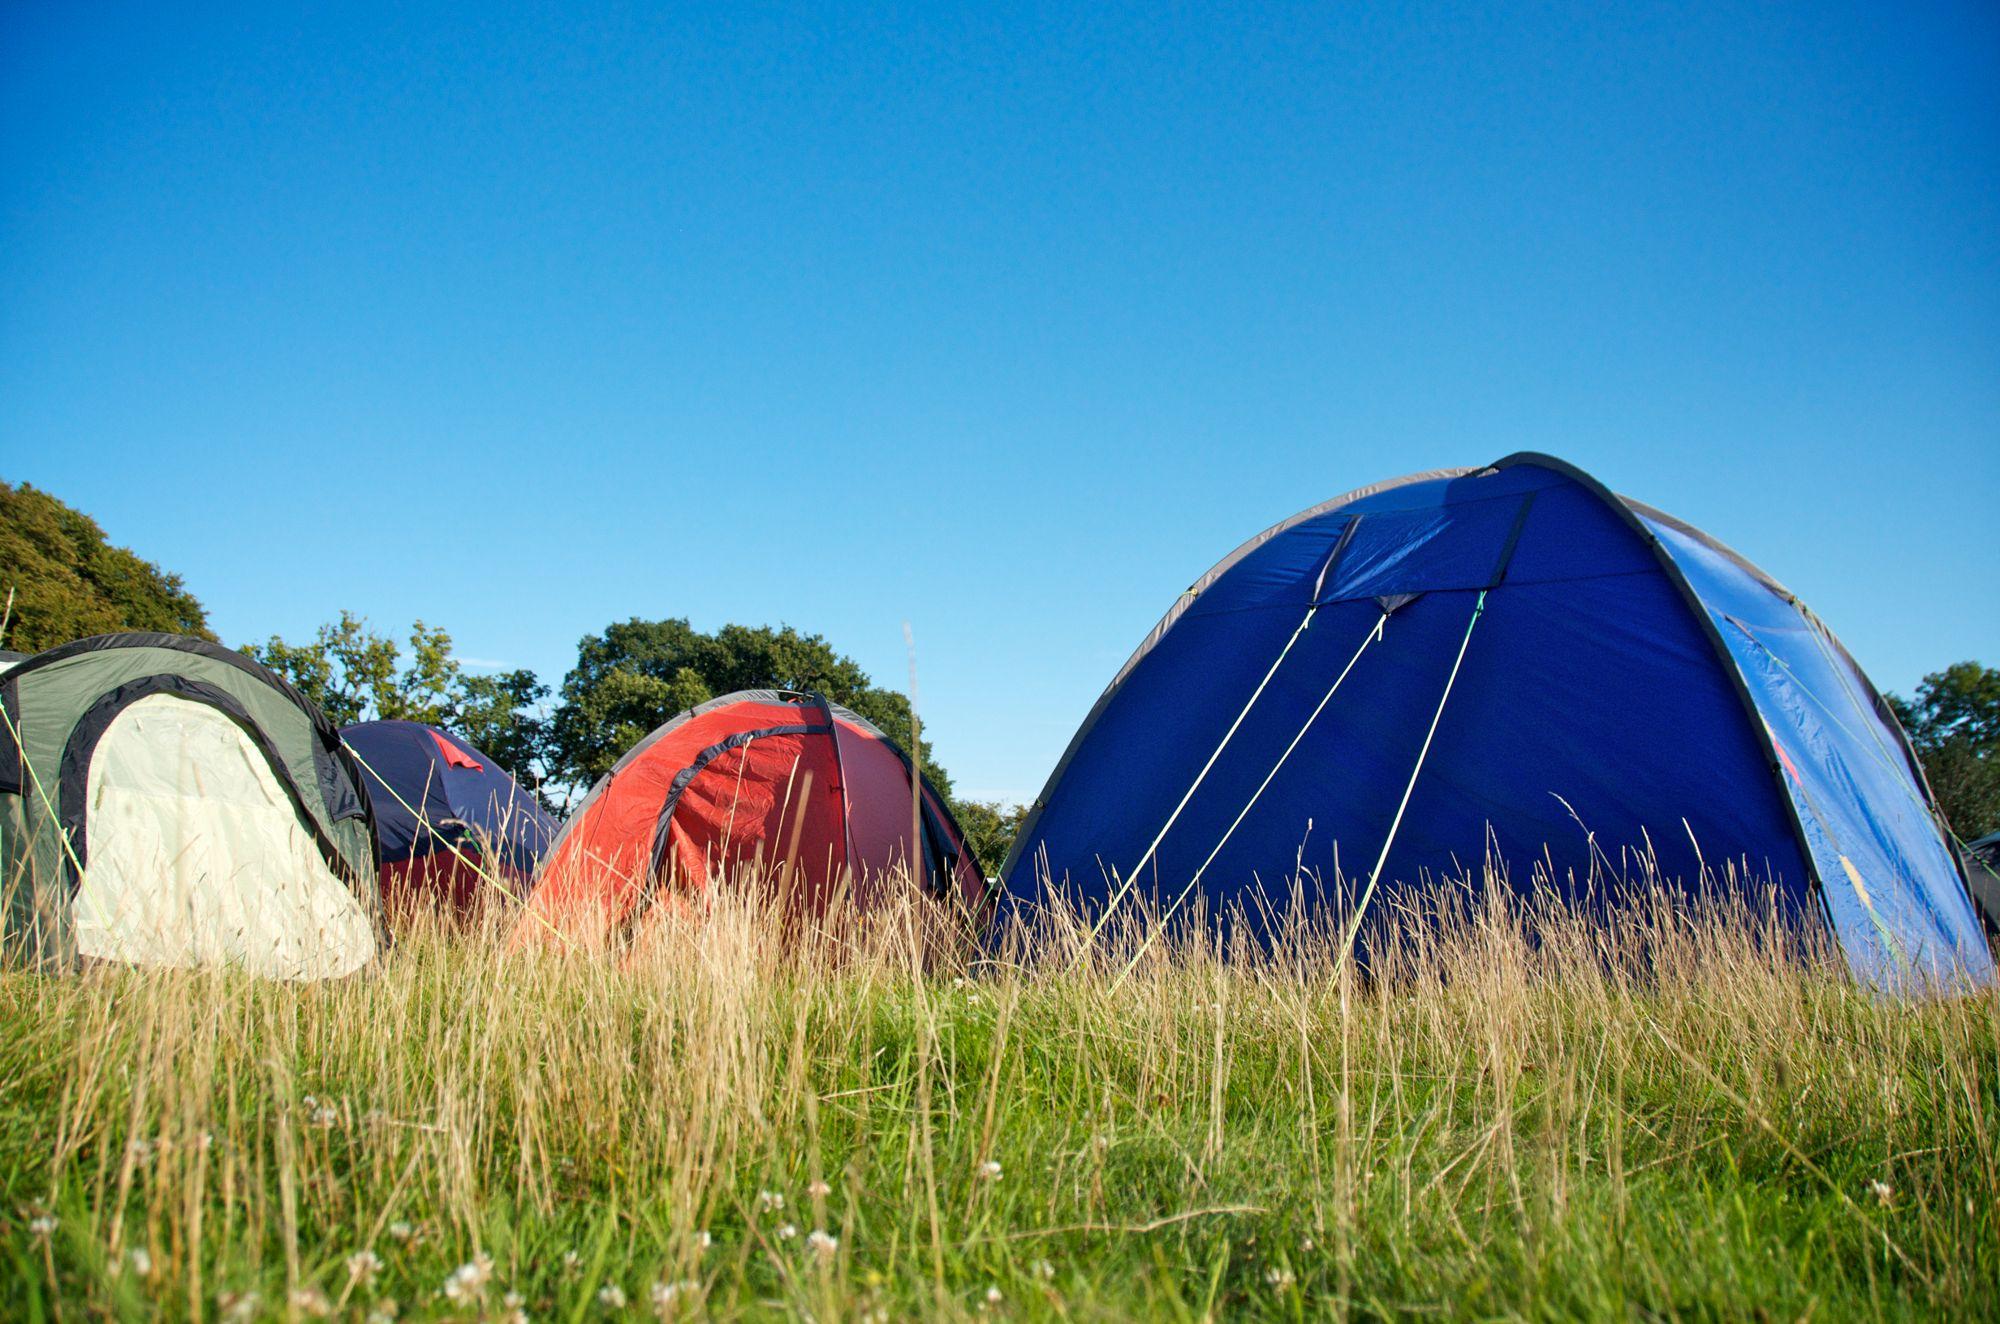 Folly Farm Campsite